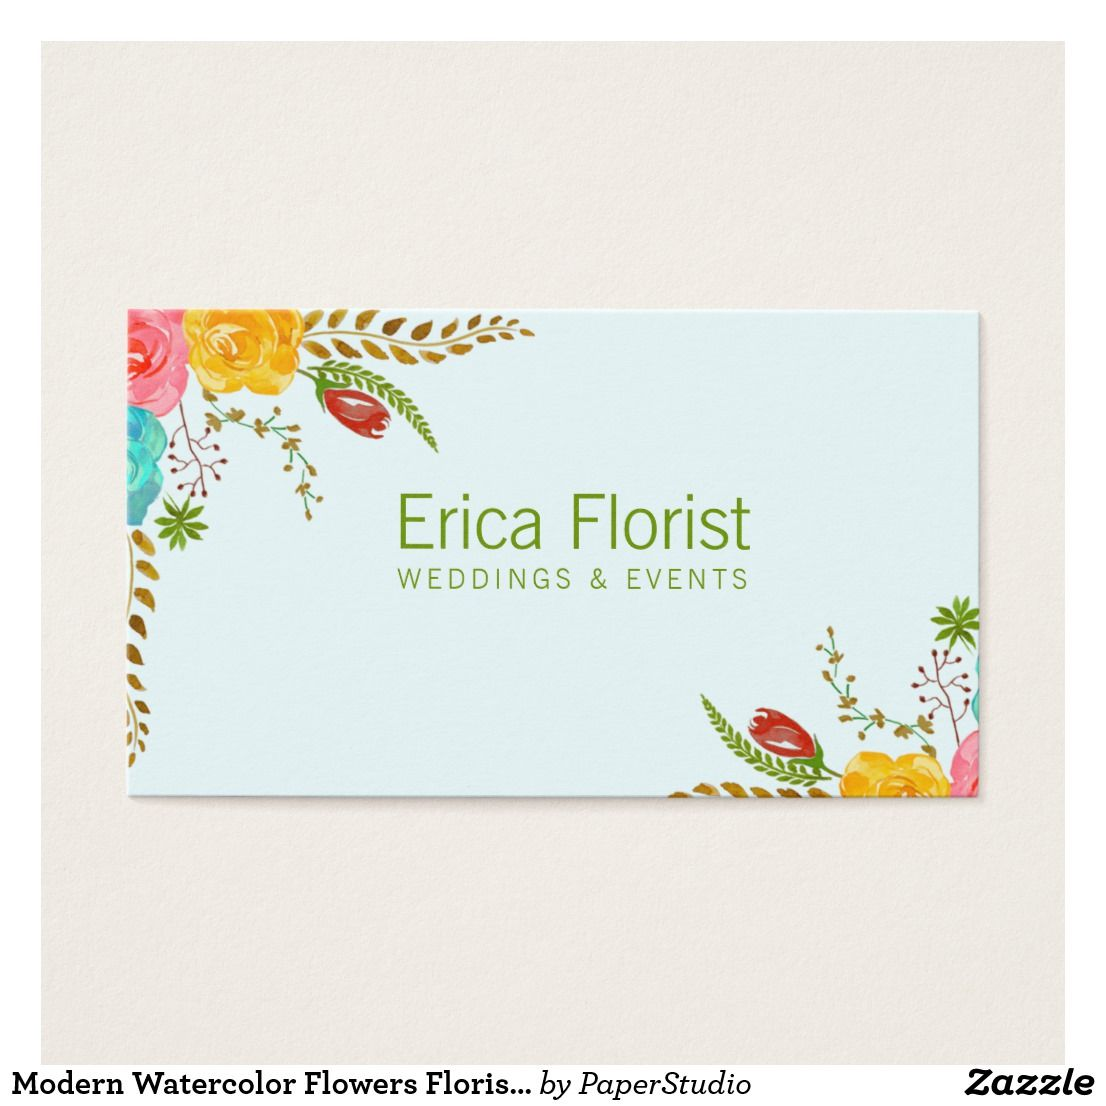 Modern watercolor flowers florist business card zazzle pinterest